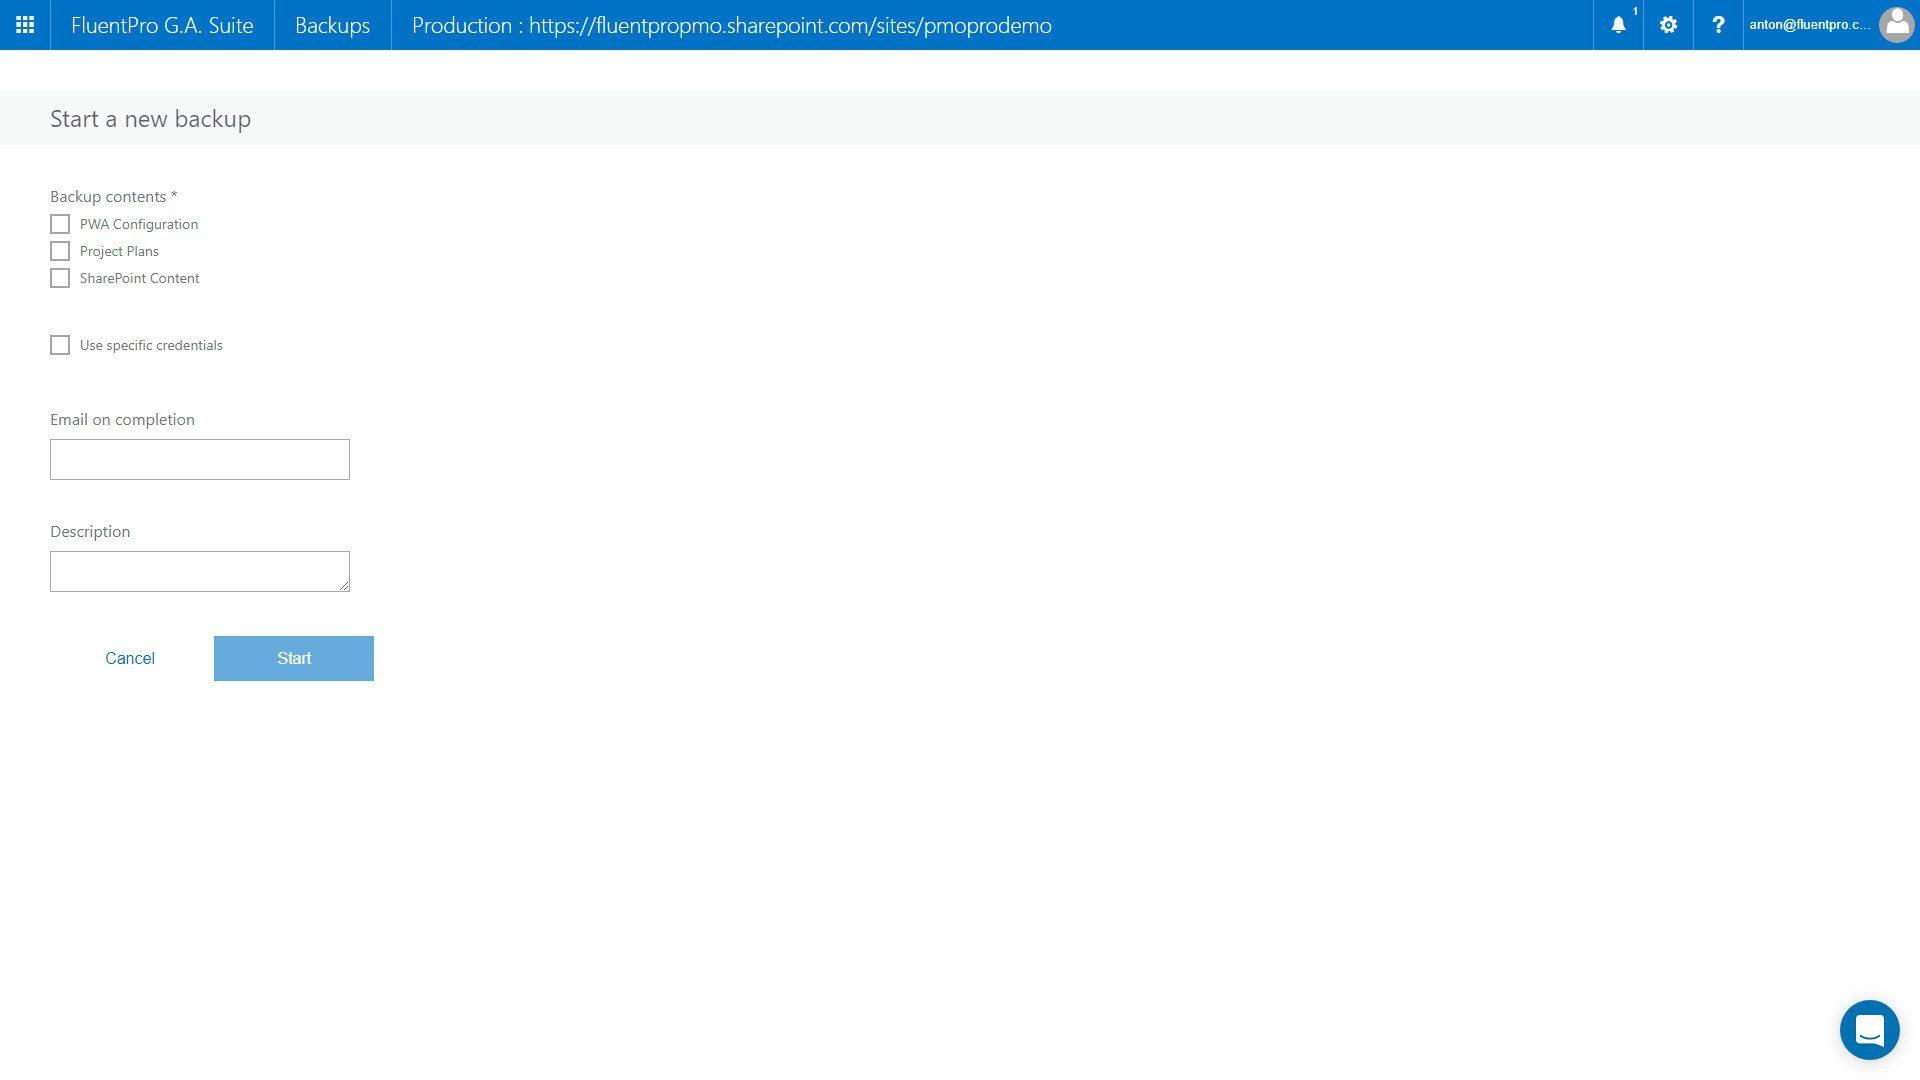 FluentPro Project Online Backup